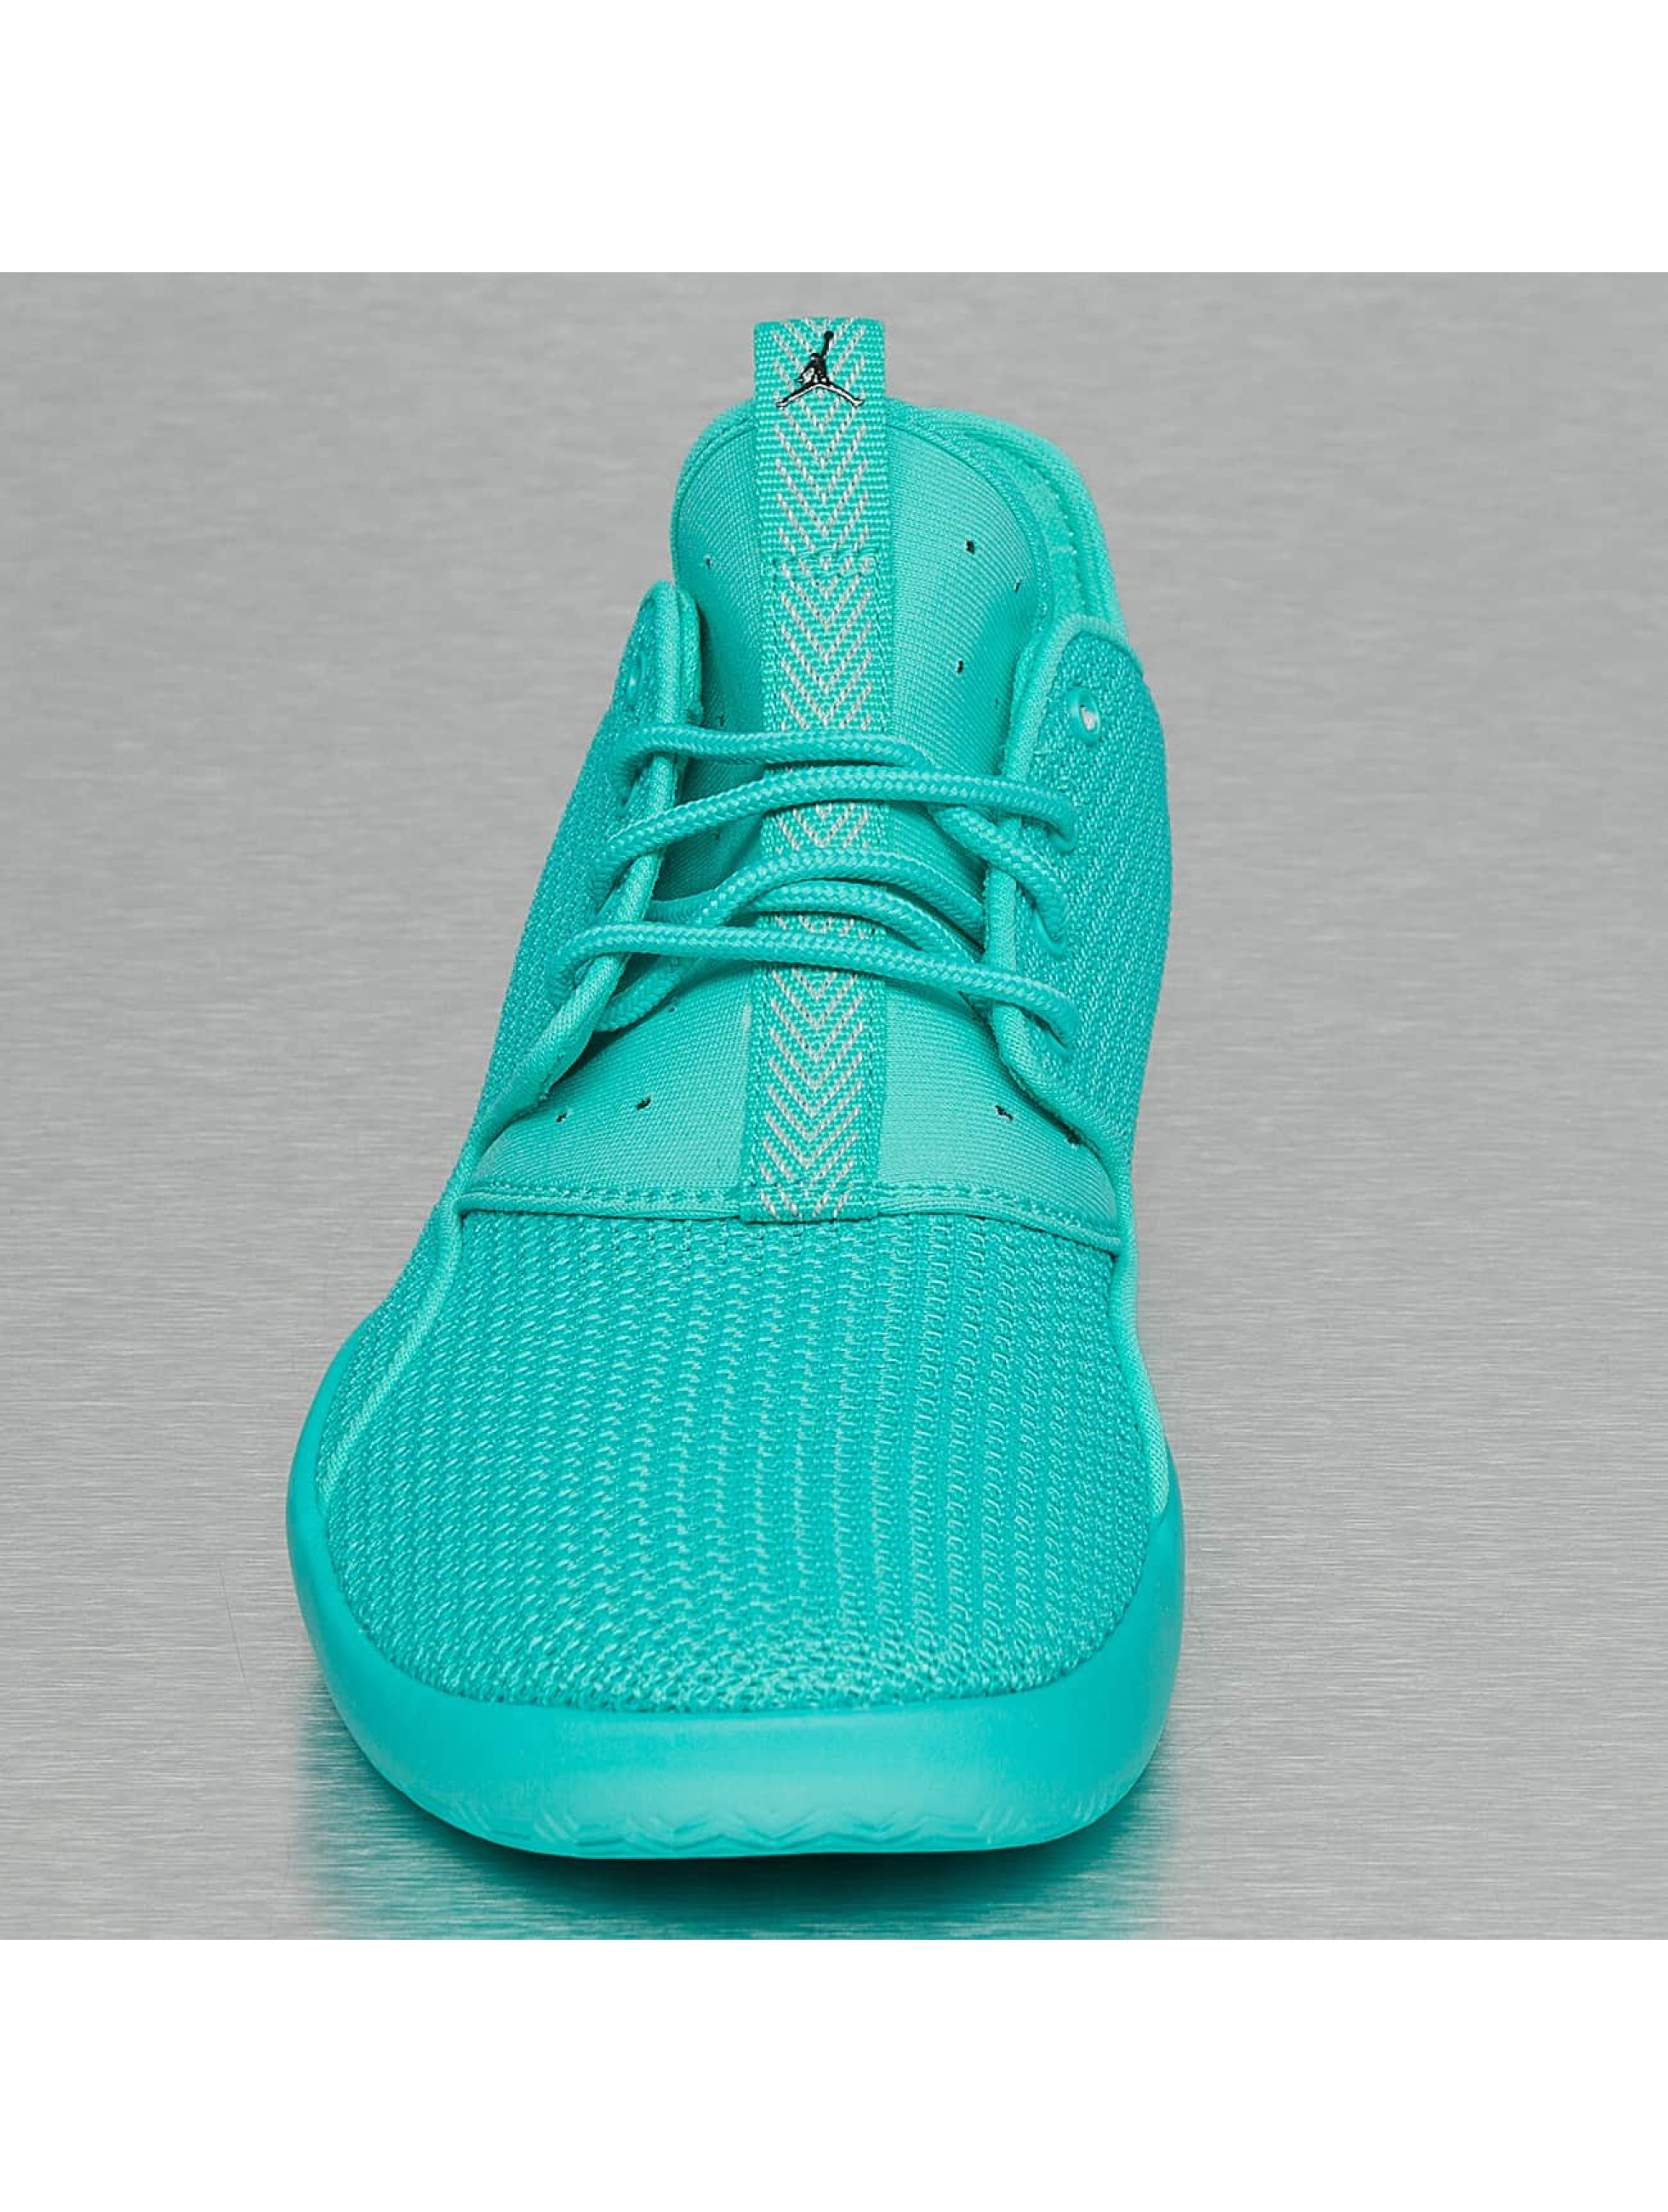 Jordan Baskets Eclipse turquoise